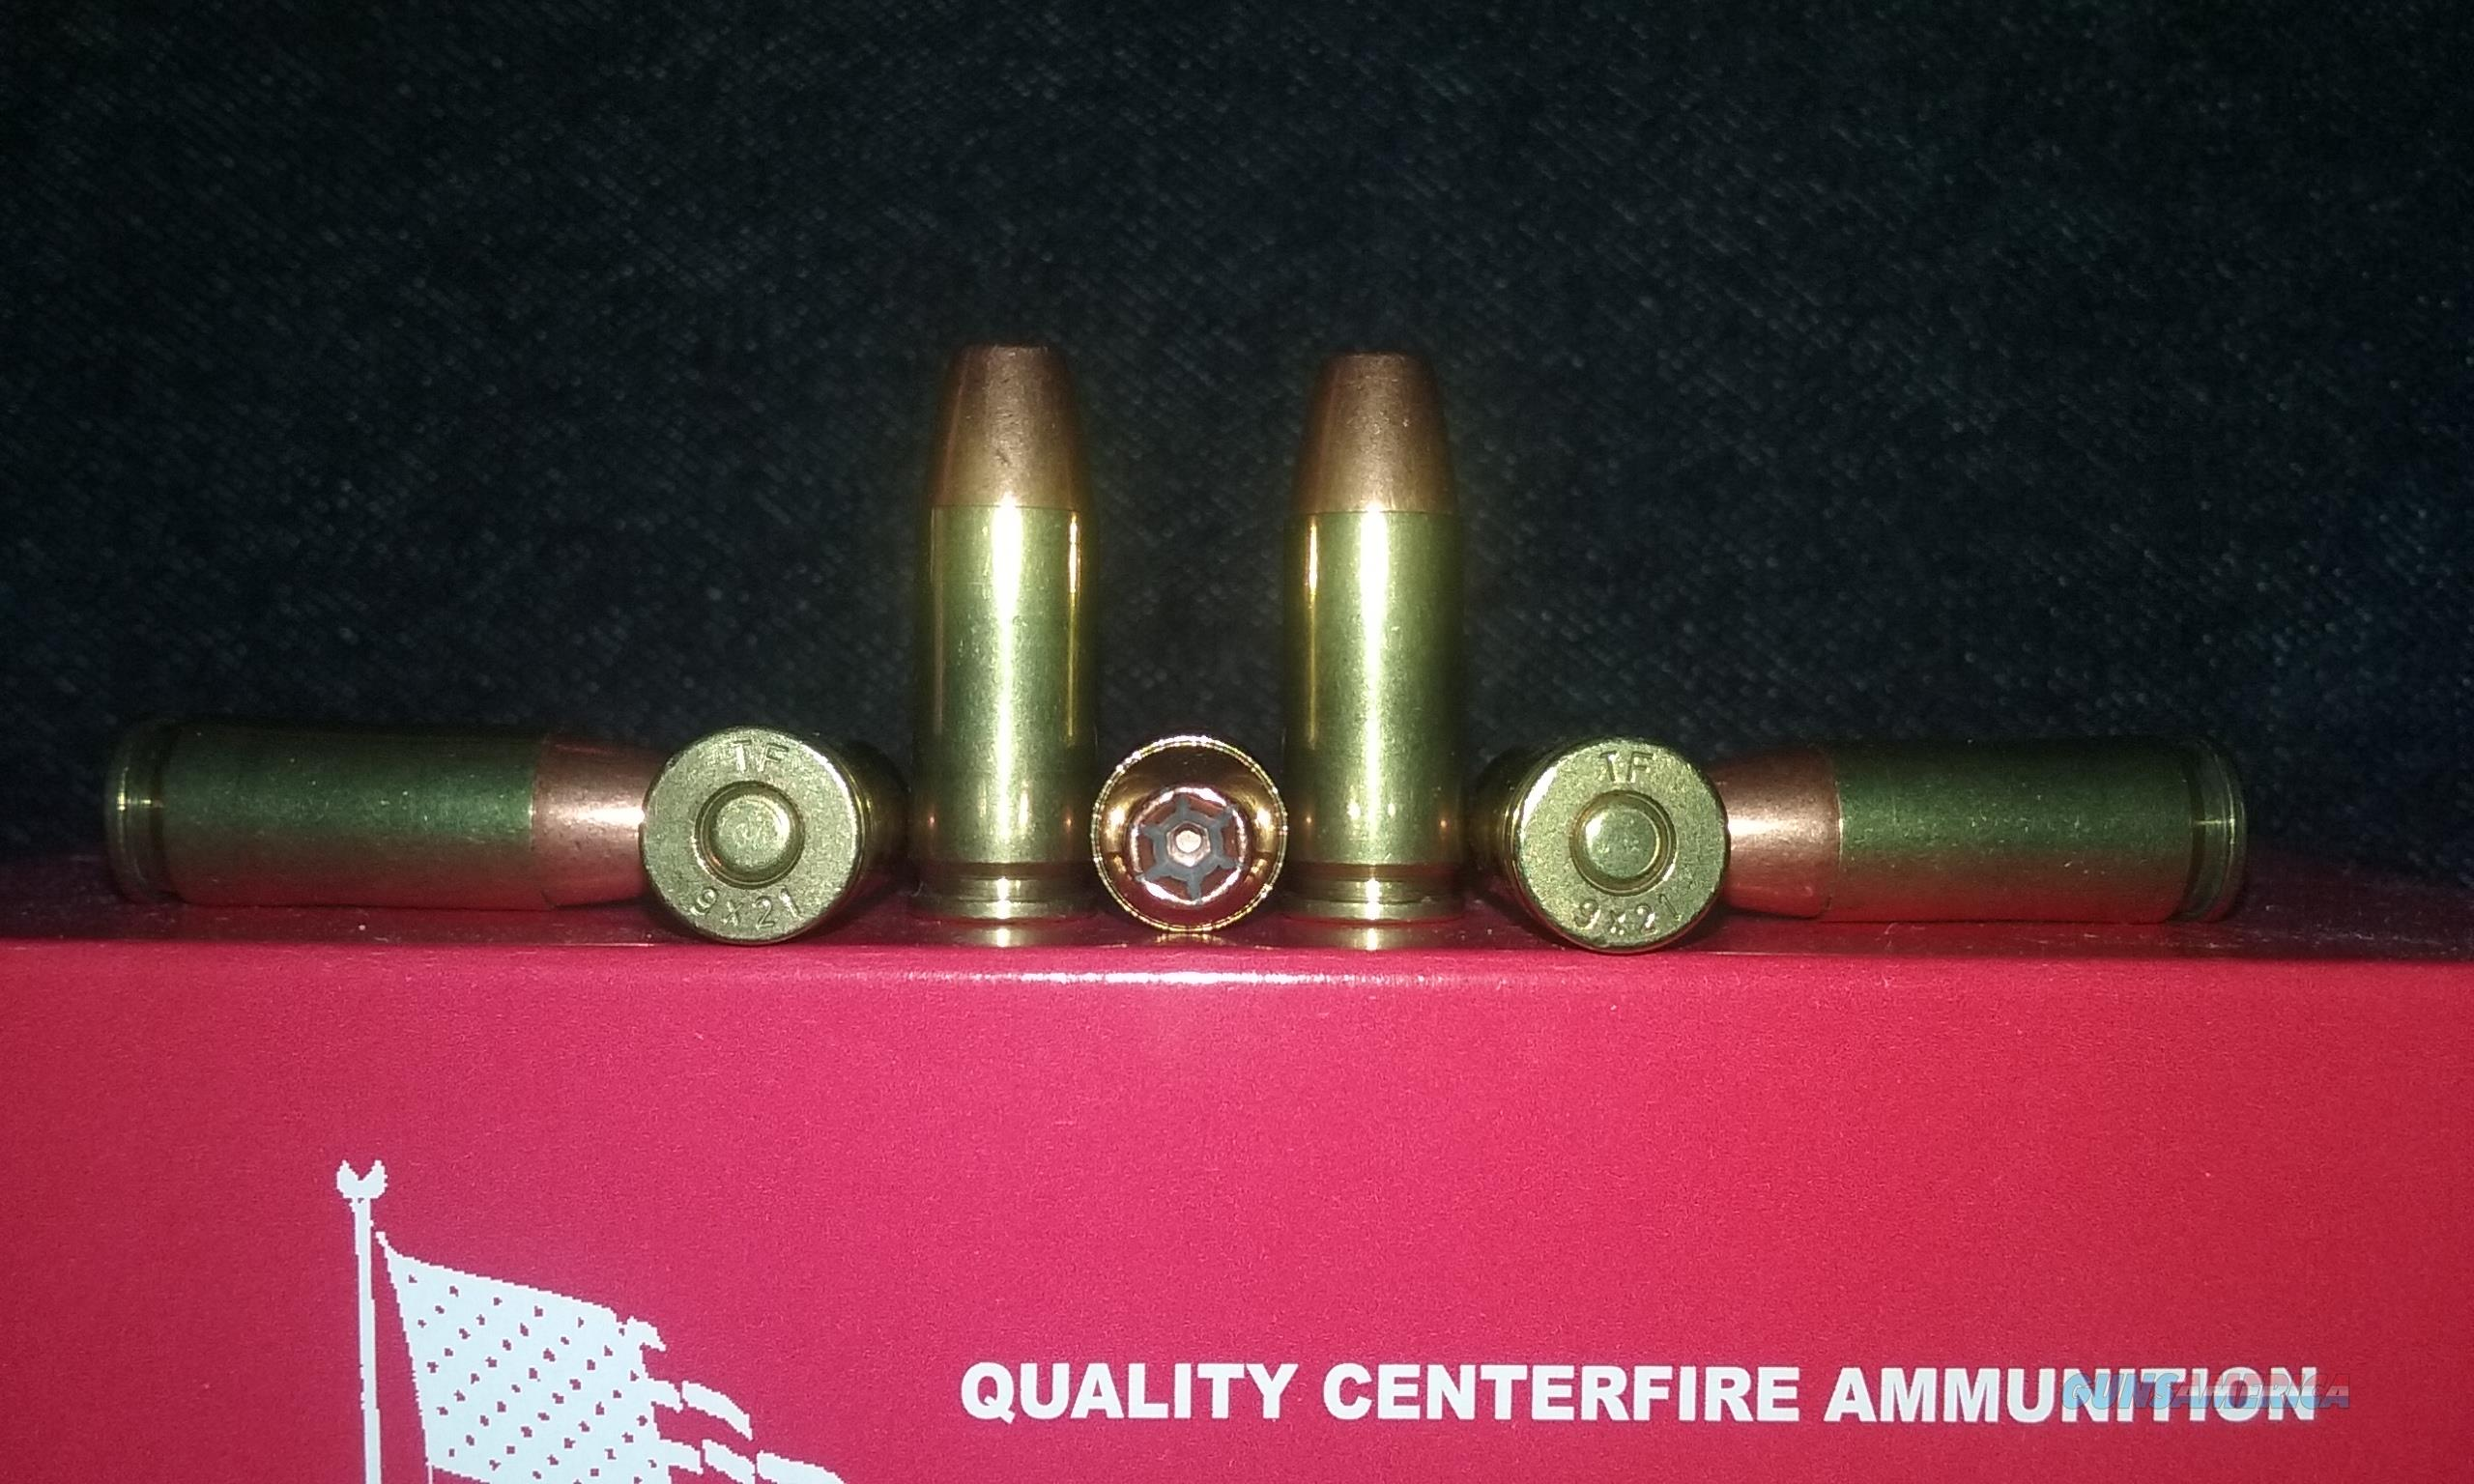 9X21 Ammo.  Non-Guns > Ammunition